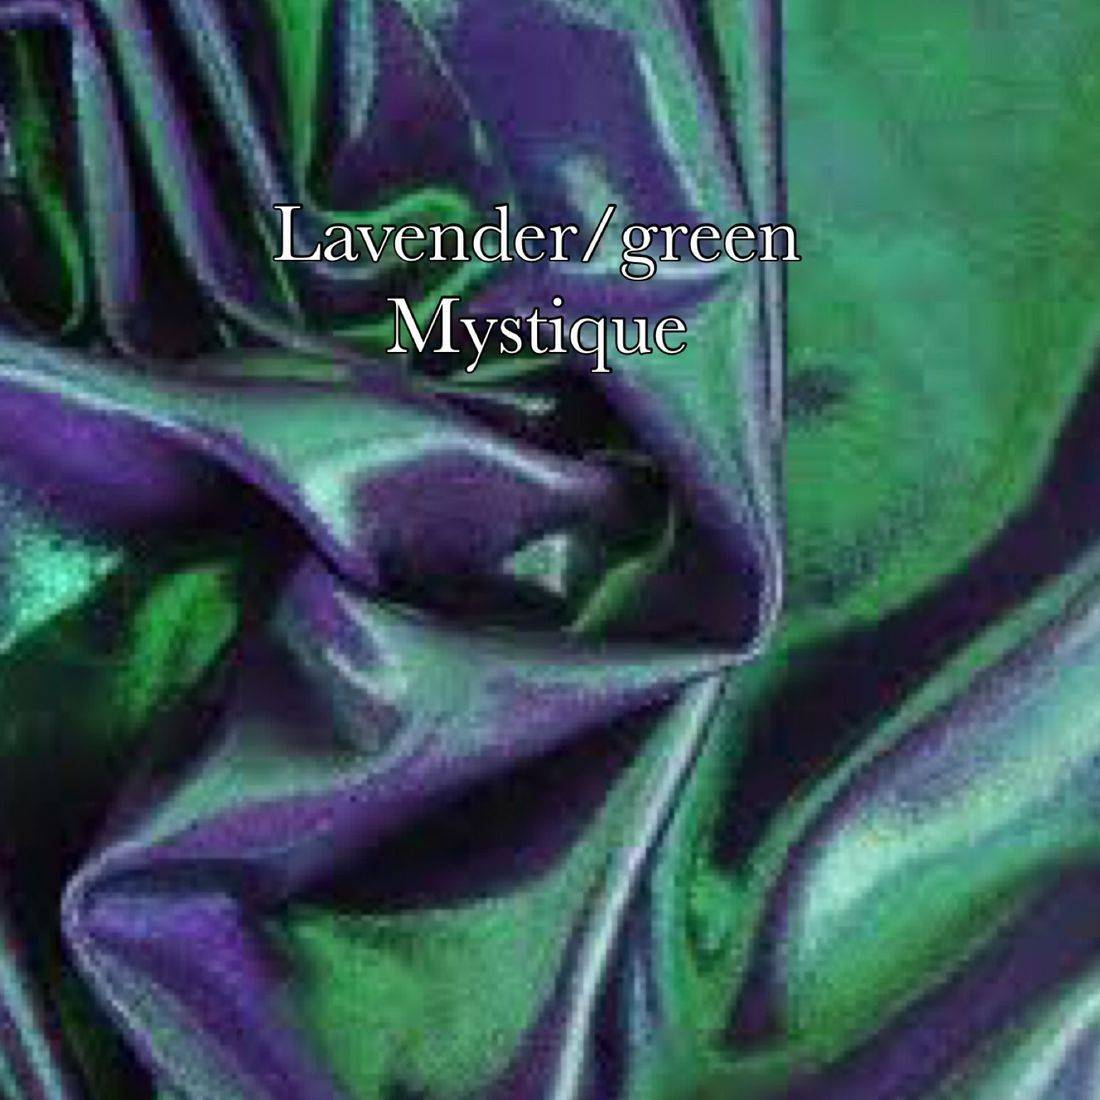 Lavender green mist